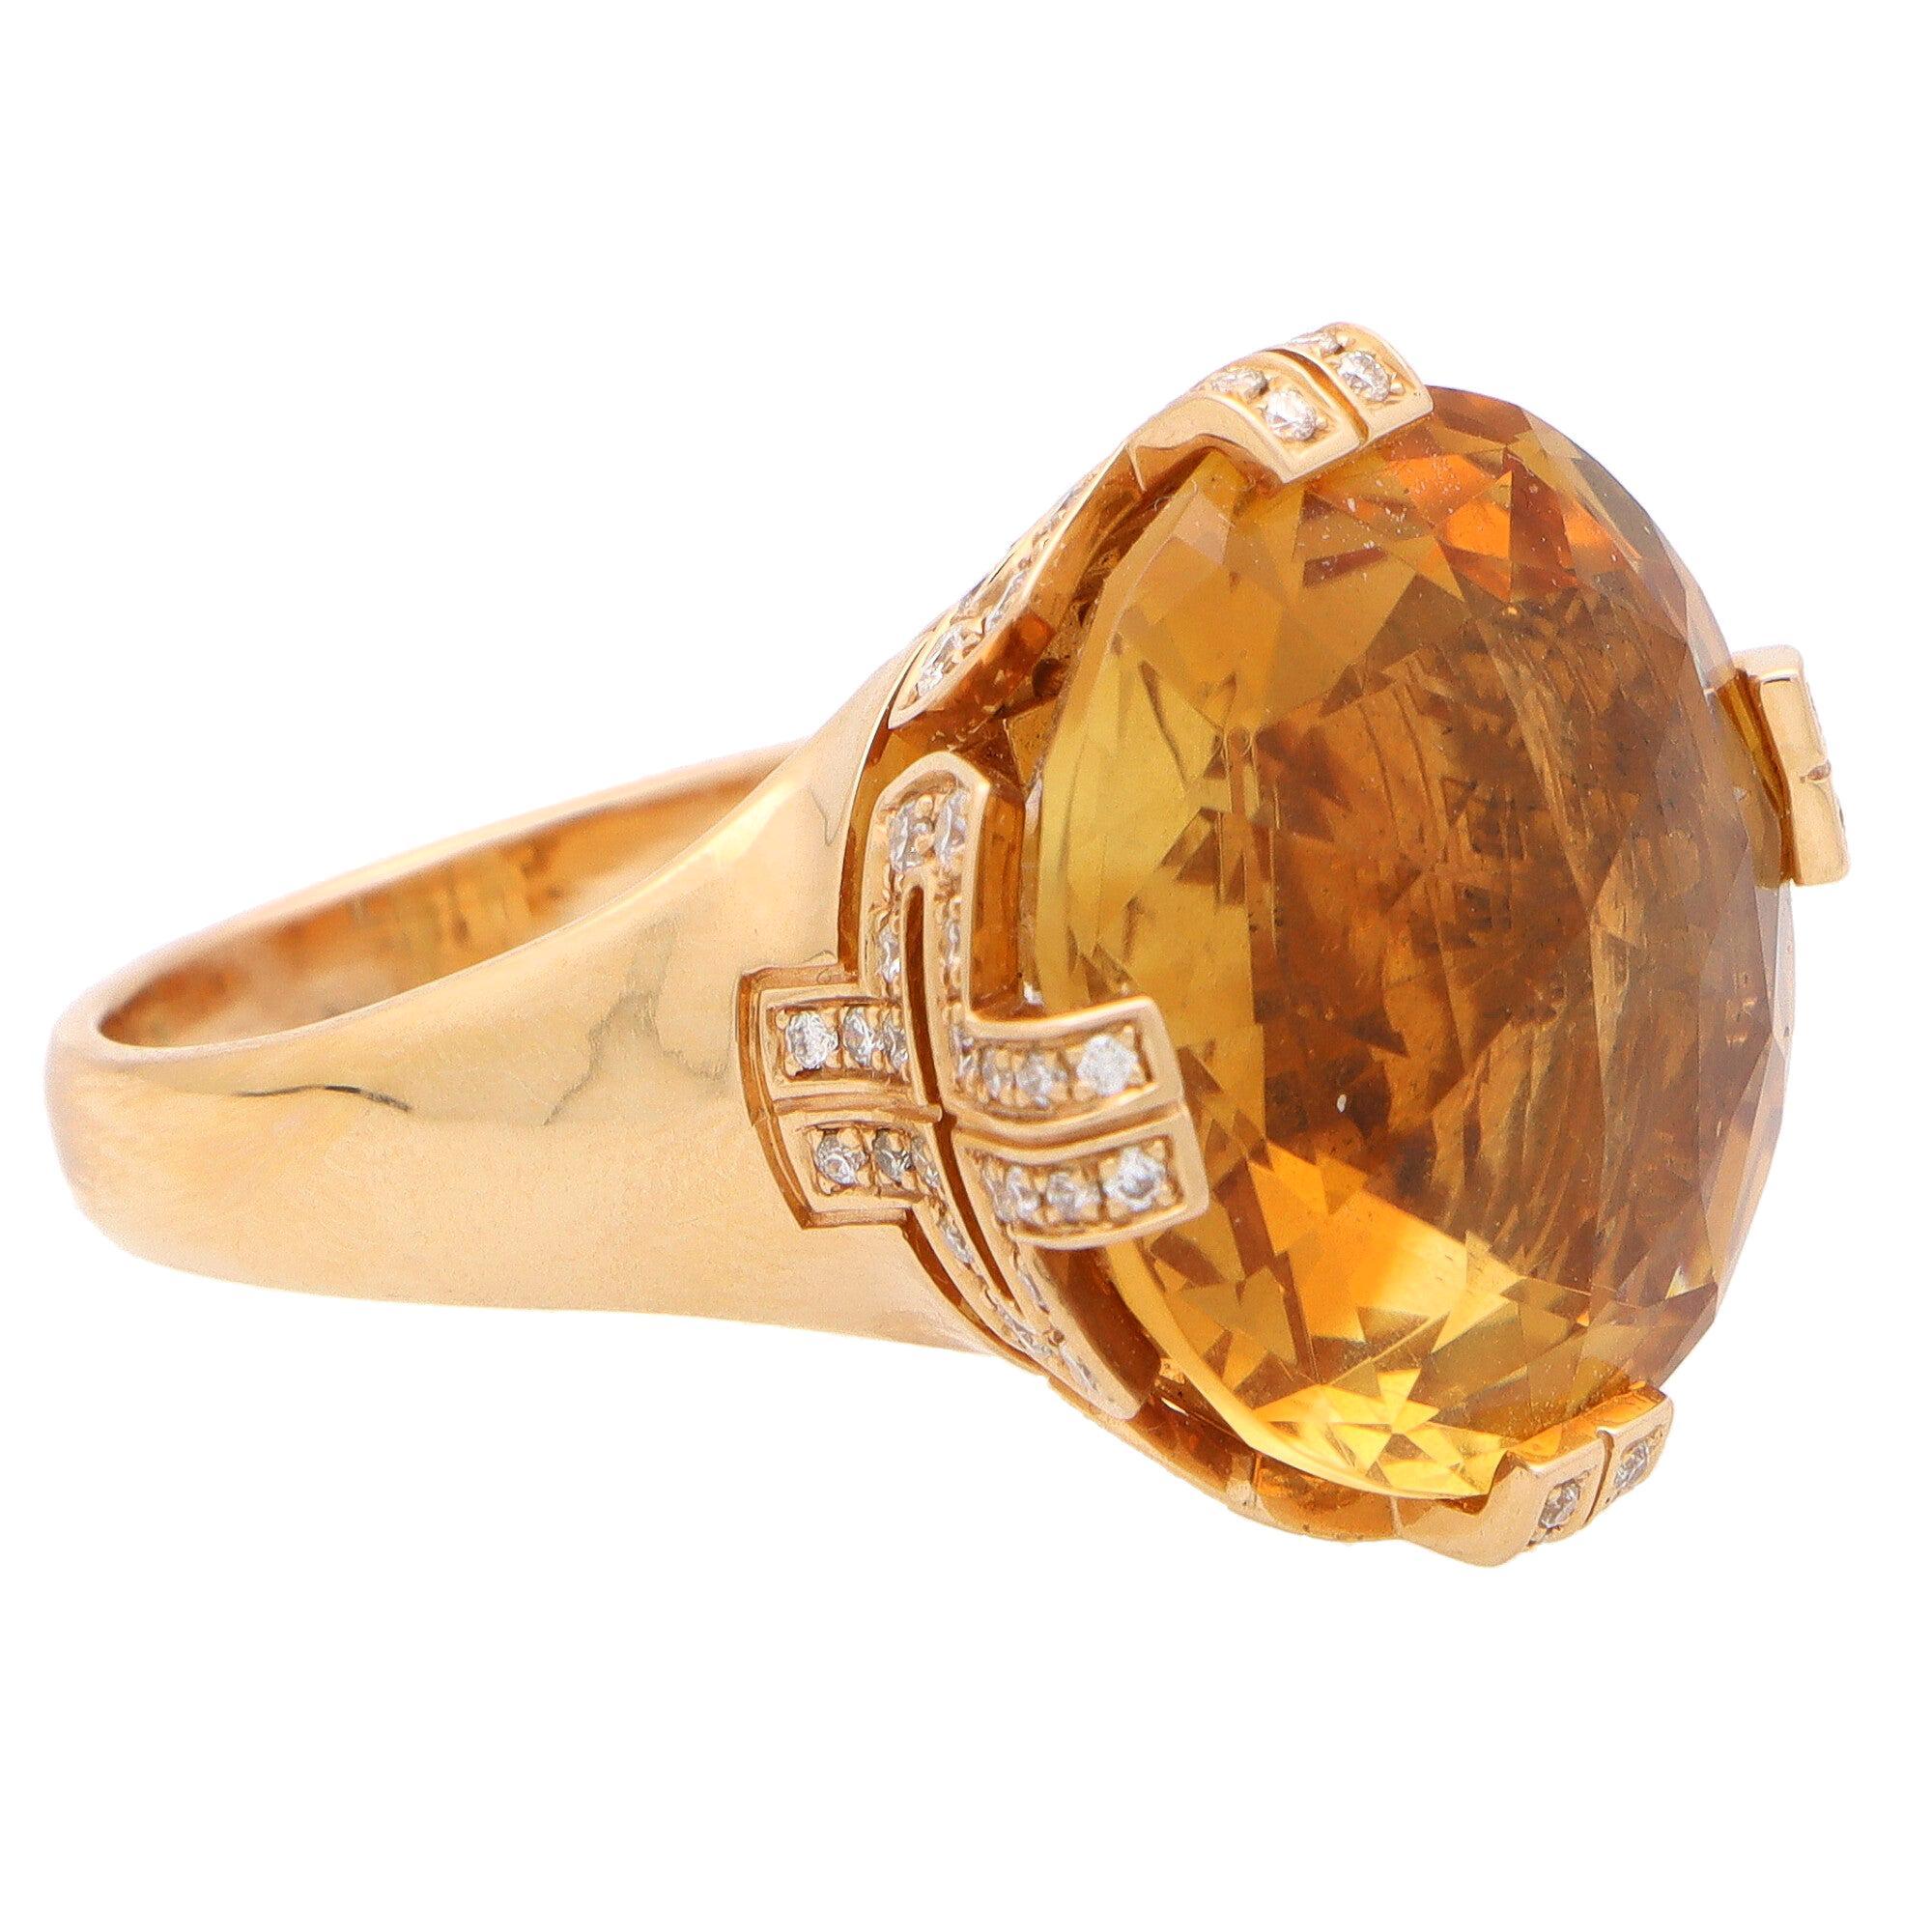 Vintage Bvlgari Parentesi Citrine and Diamond Cocktail Ring Set in 18k Rose Gold